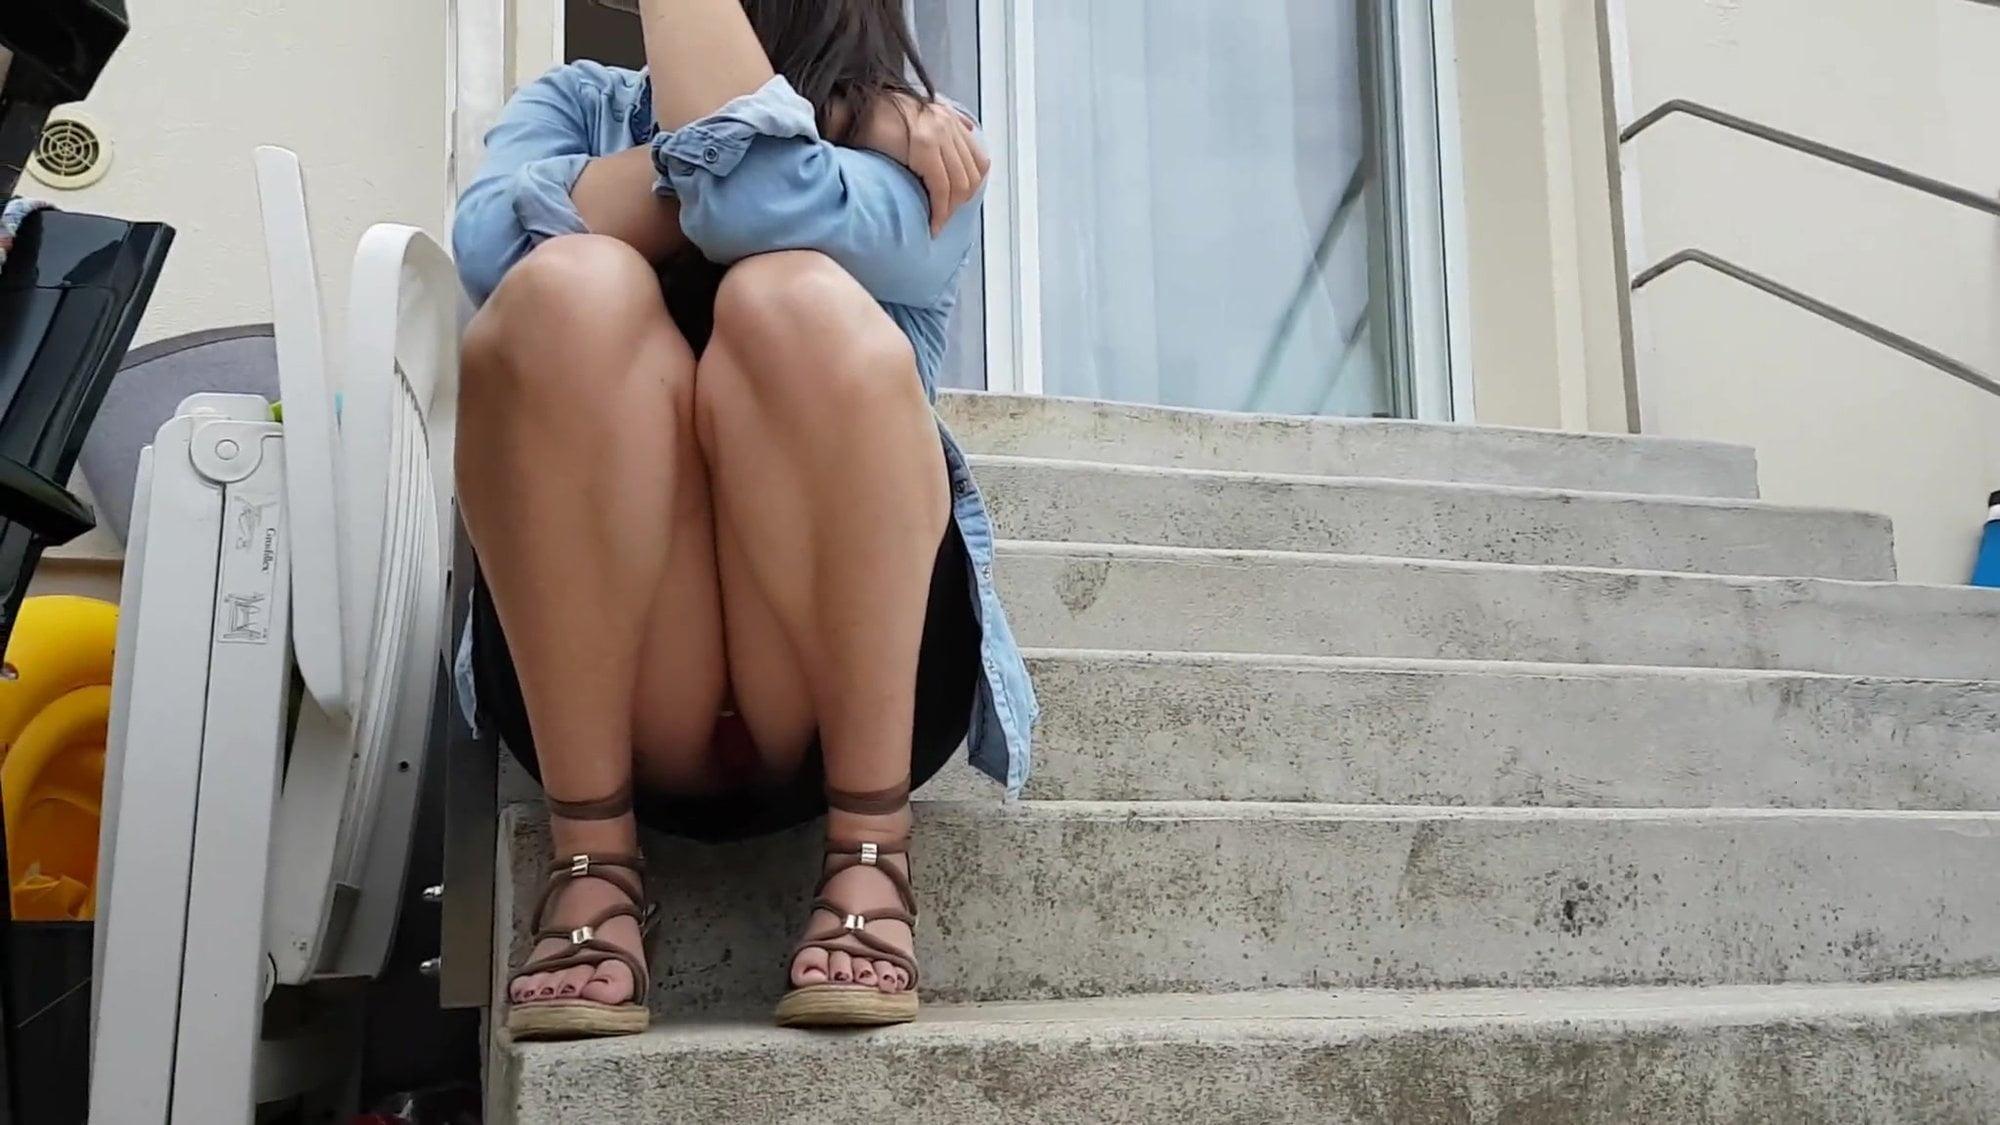 Candid Teen Feet Voyeur